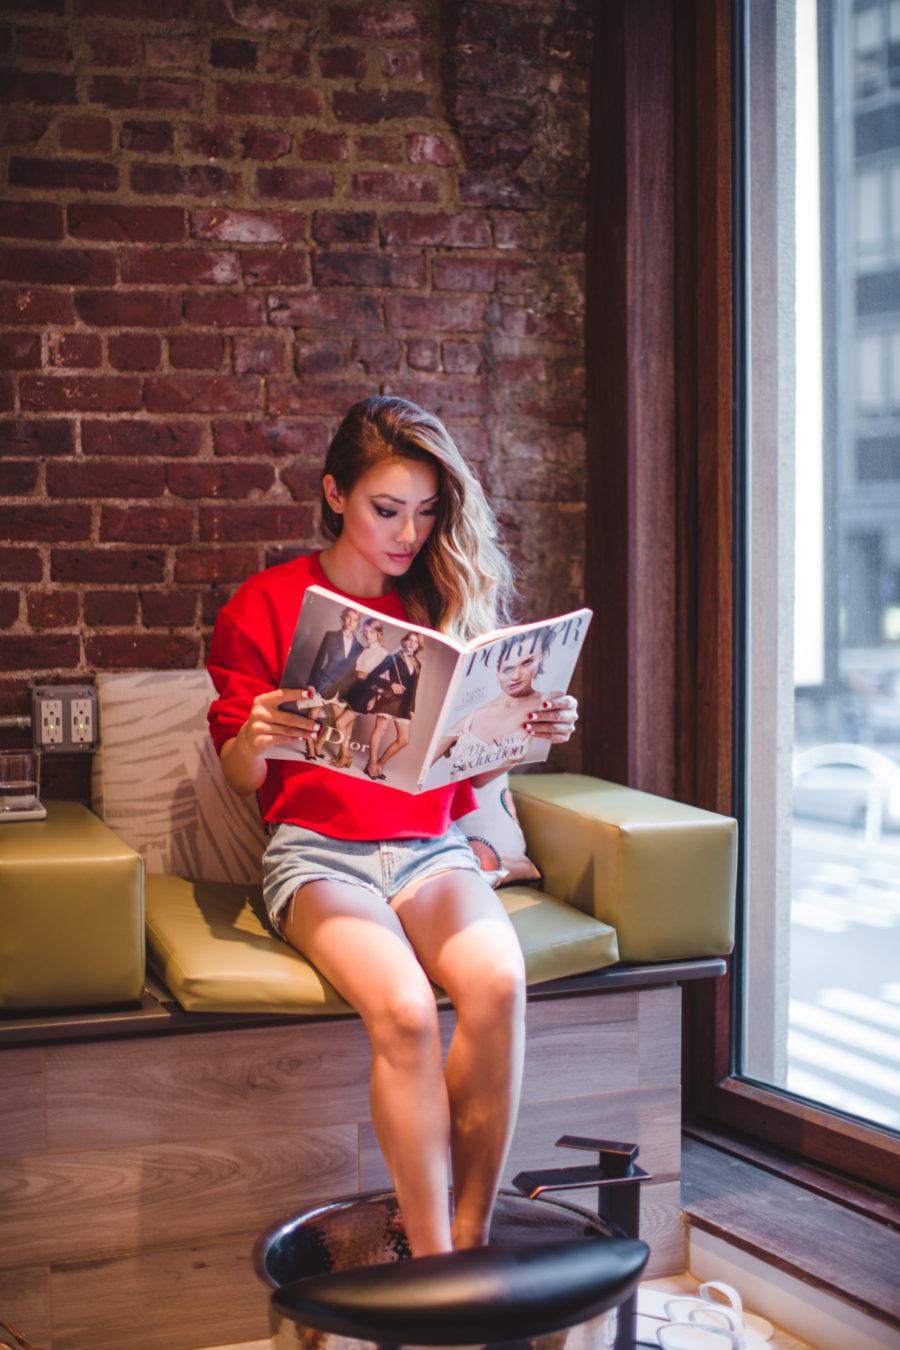 GILT CITY, THE GANDER NYC, VAN COURT SALON, NOTJESSFASHION, NYC, Top Fashion Blogger, Lifestyle Blogger, Travel Blogger